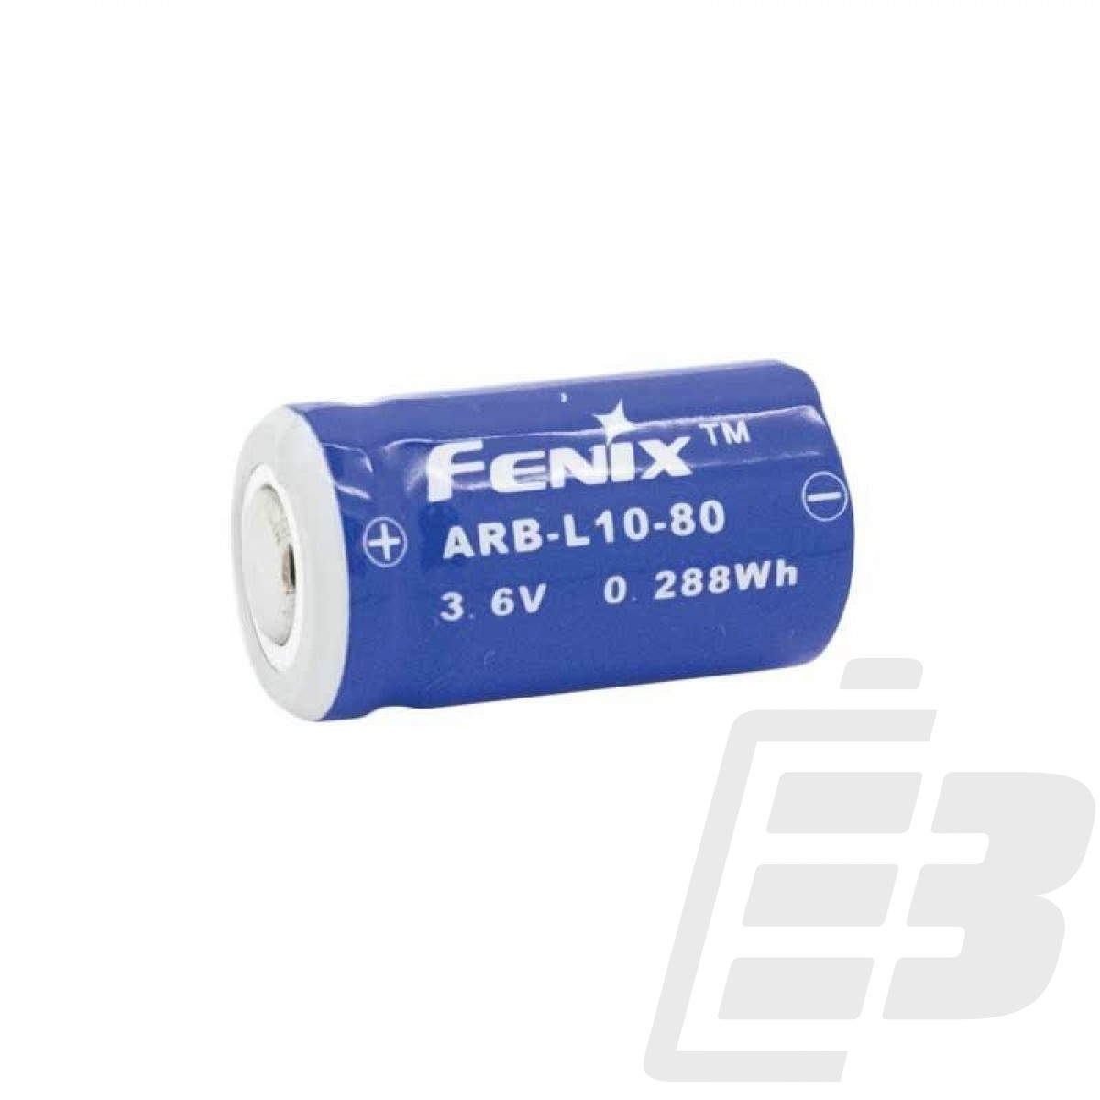 Fenix 10180 ARB-L10-80 battery 80mAh